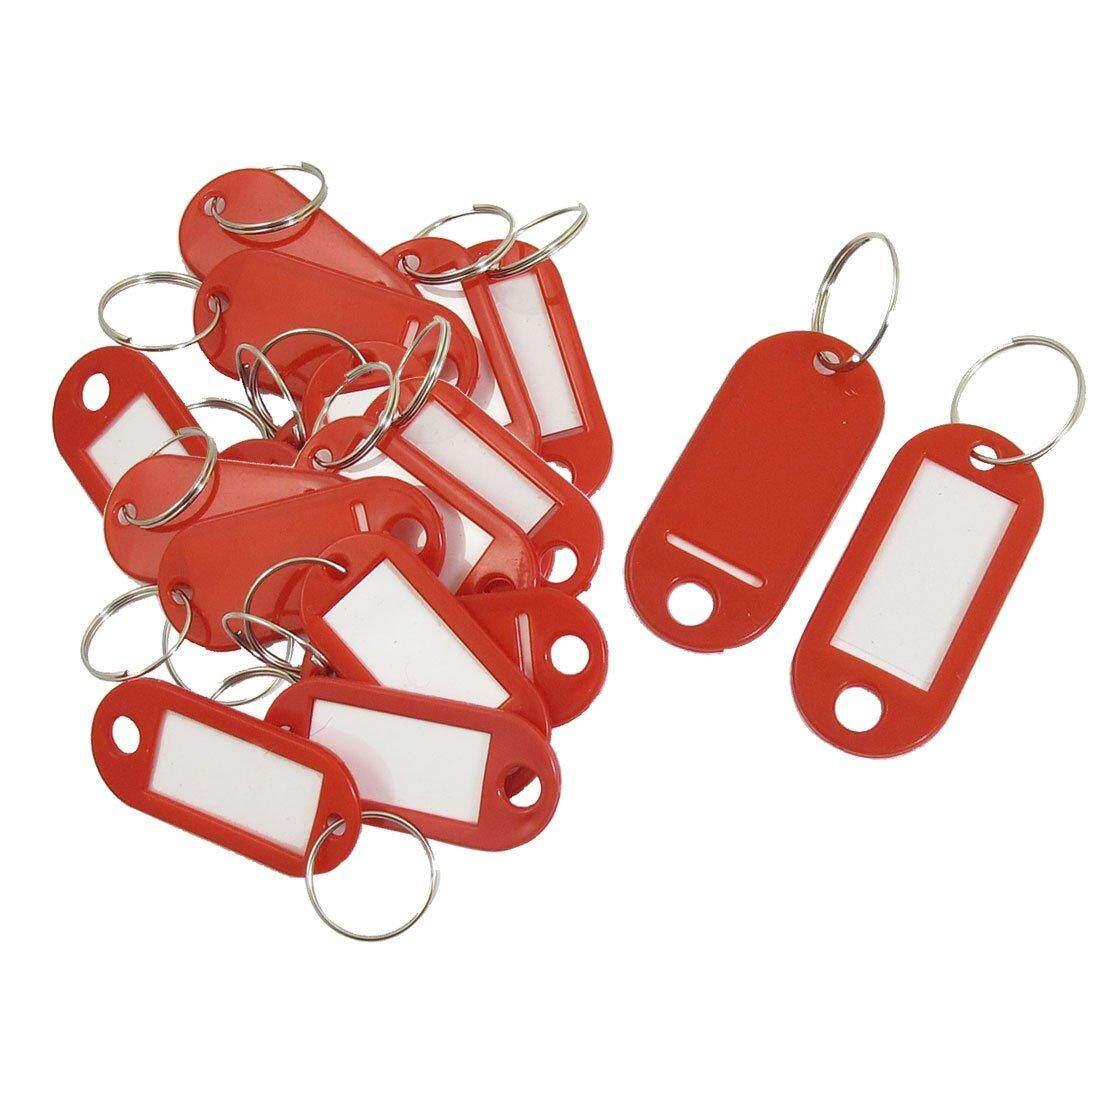 20 Pcs Kunci Identitas Label Label Split Lingkaran Gantungan Kunci Merah-Internasional